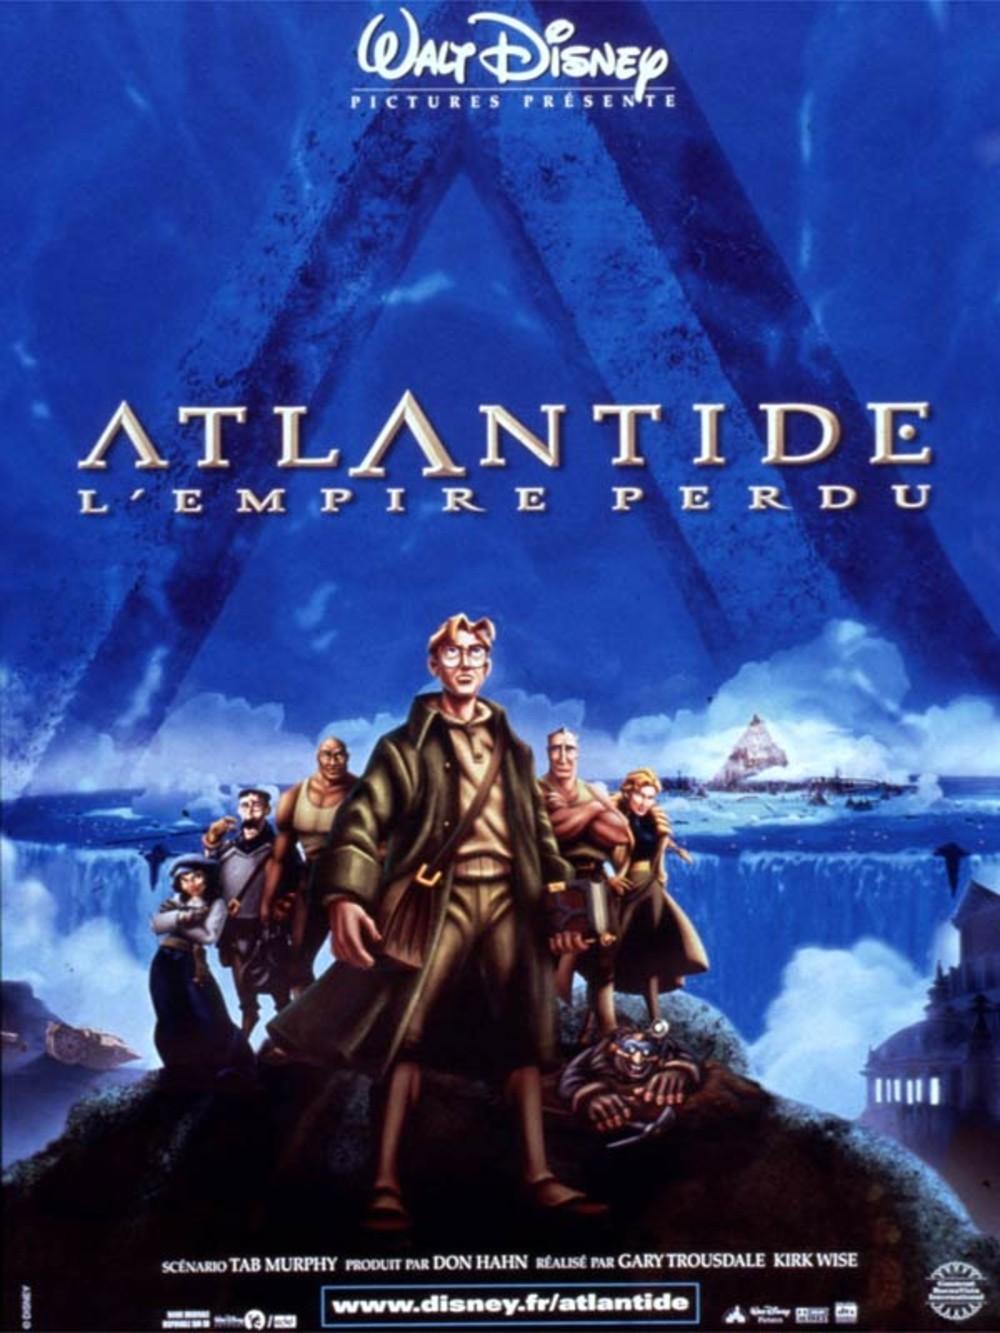 Le Mal Aimé Atlantide L Empire Perdu La Grande Occasion Manquée De Disney